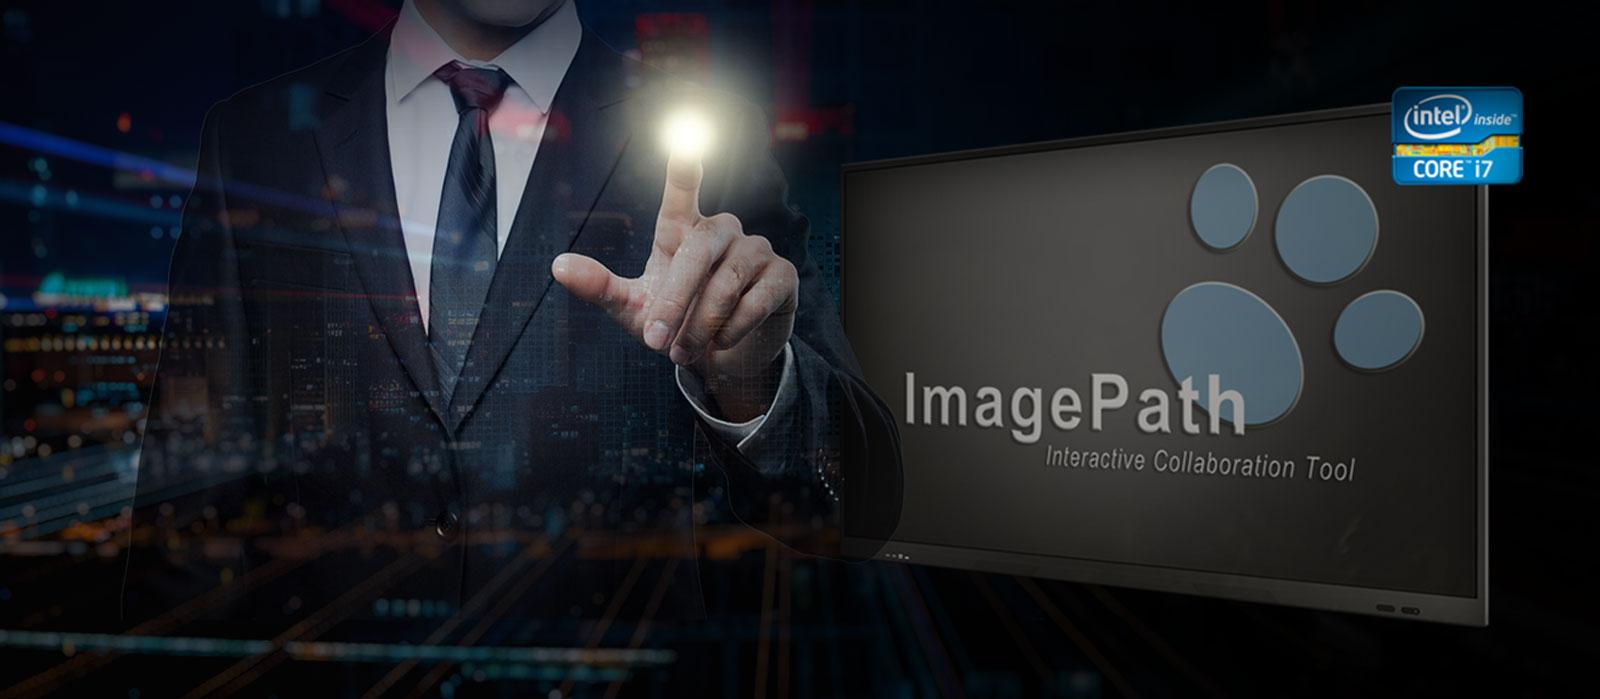 ImagePath